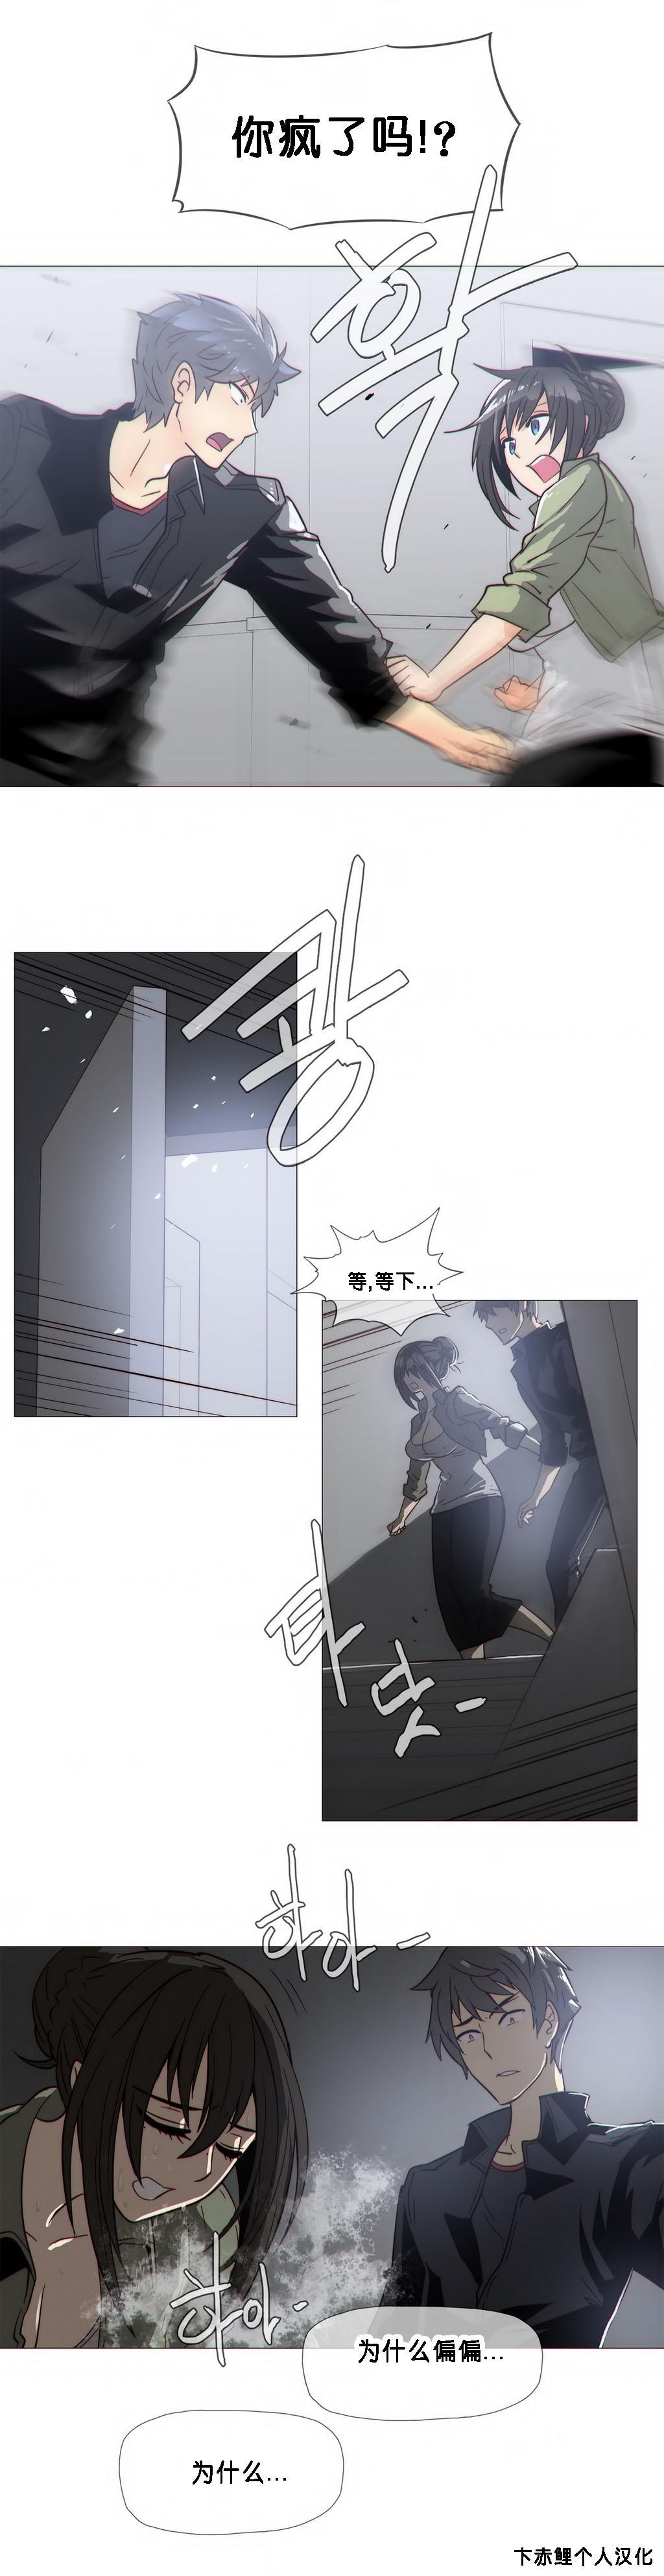 HouseHold Affairs 【卞赤鲤个人汉化】1~21话(持续更新中) 469